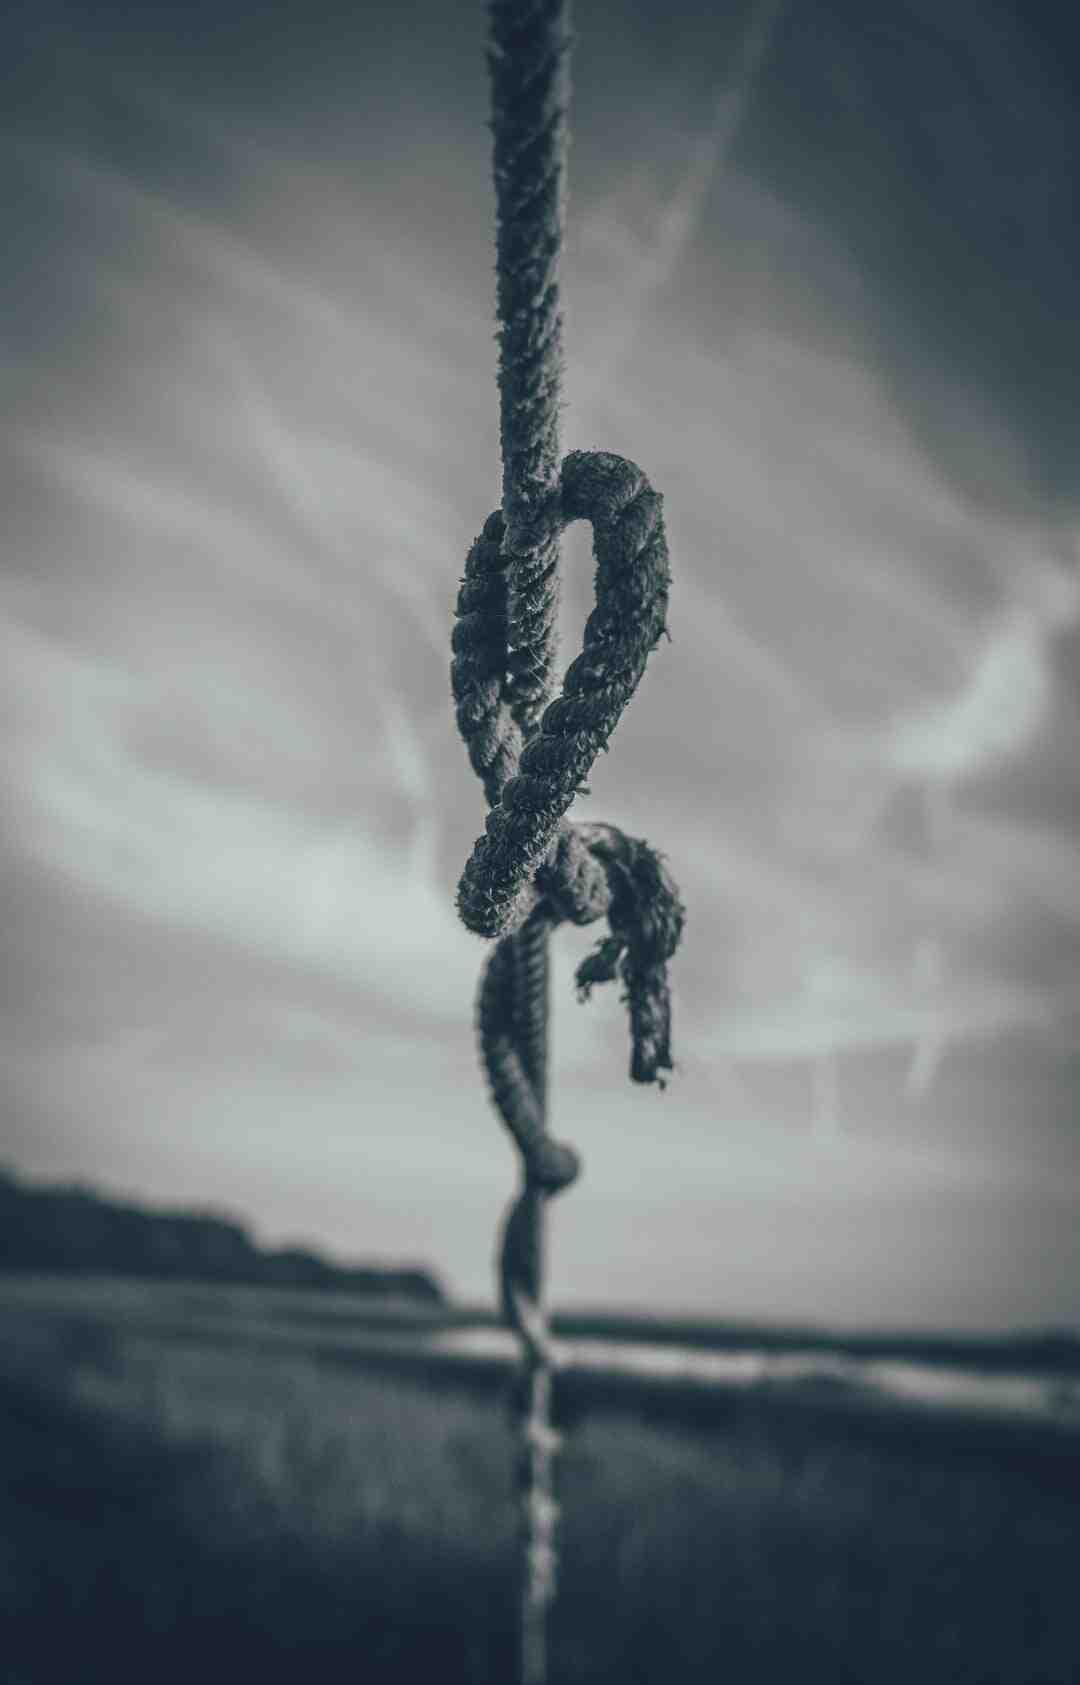 Quand changer de corde d'escalade ?